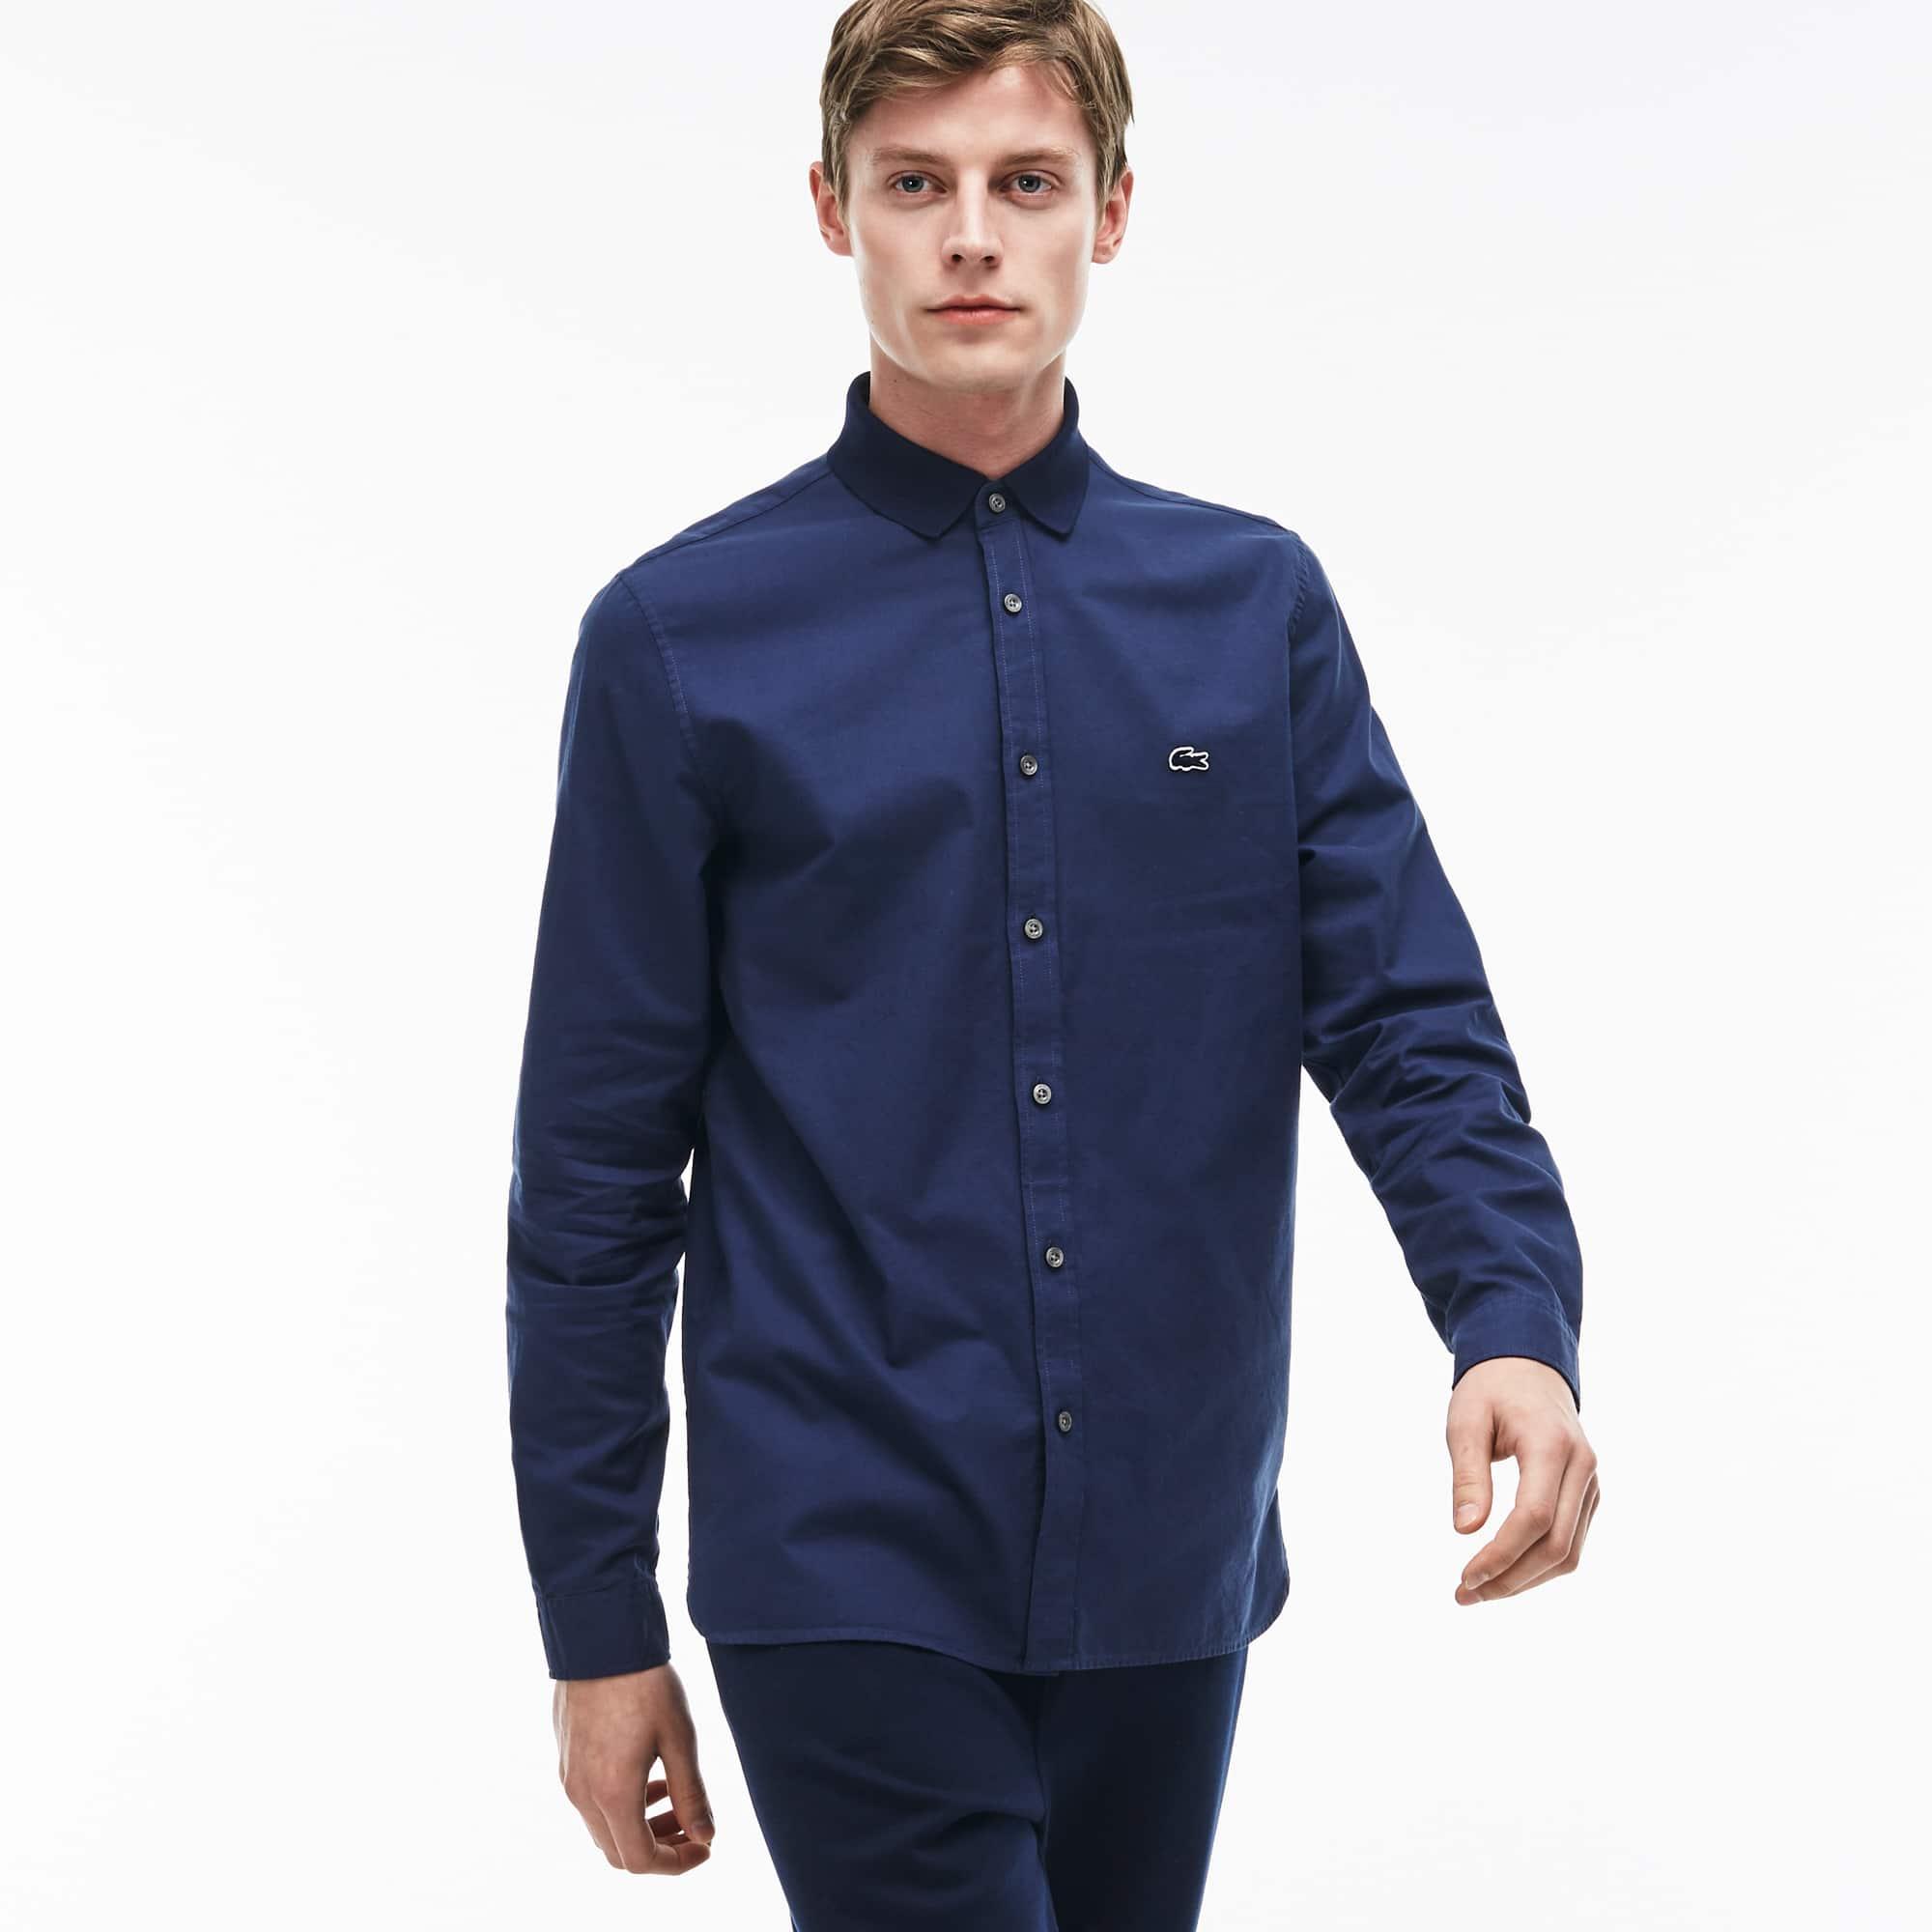 Men's Regular Fit Ribbed Neckline Oxford Cotton Shirt